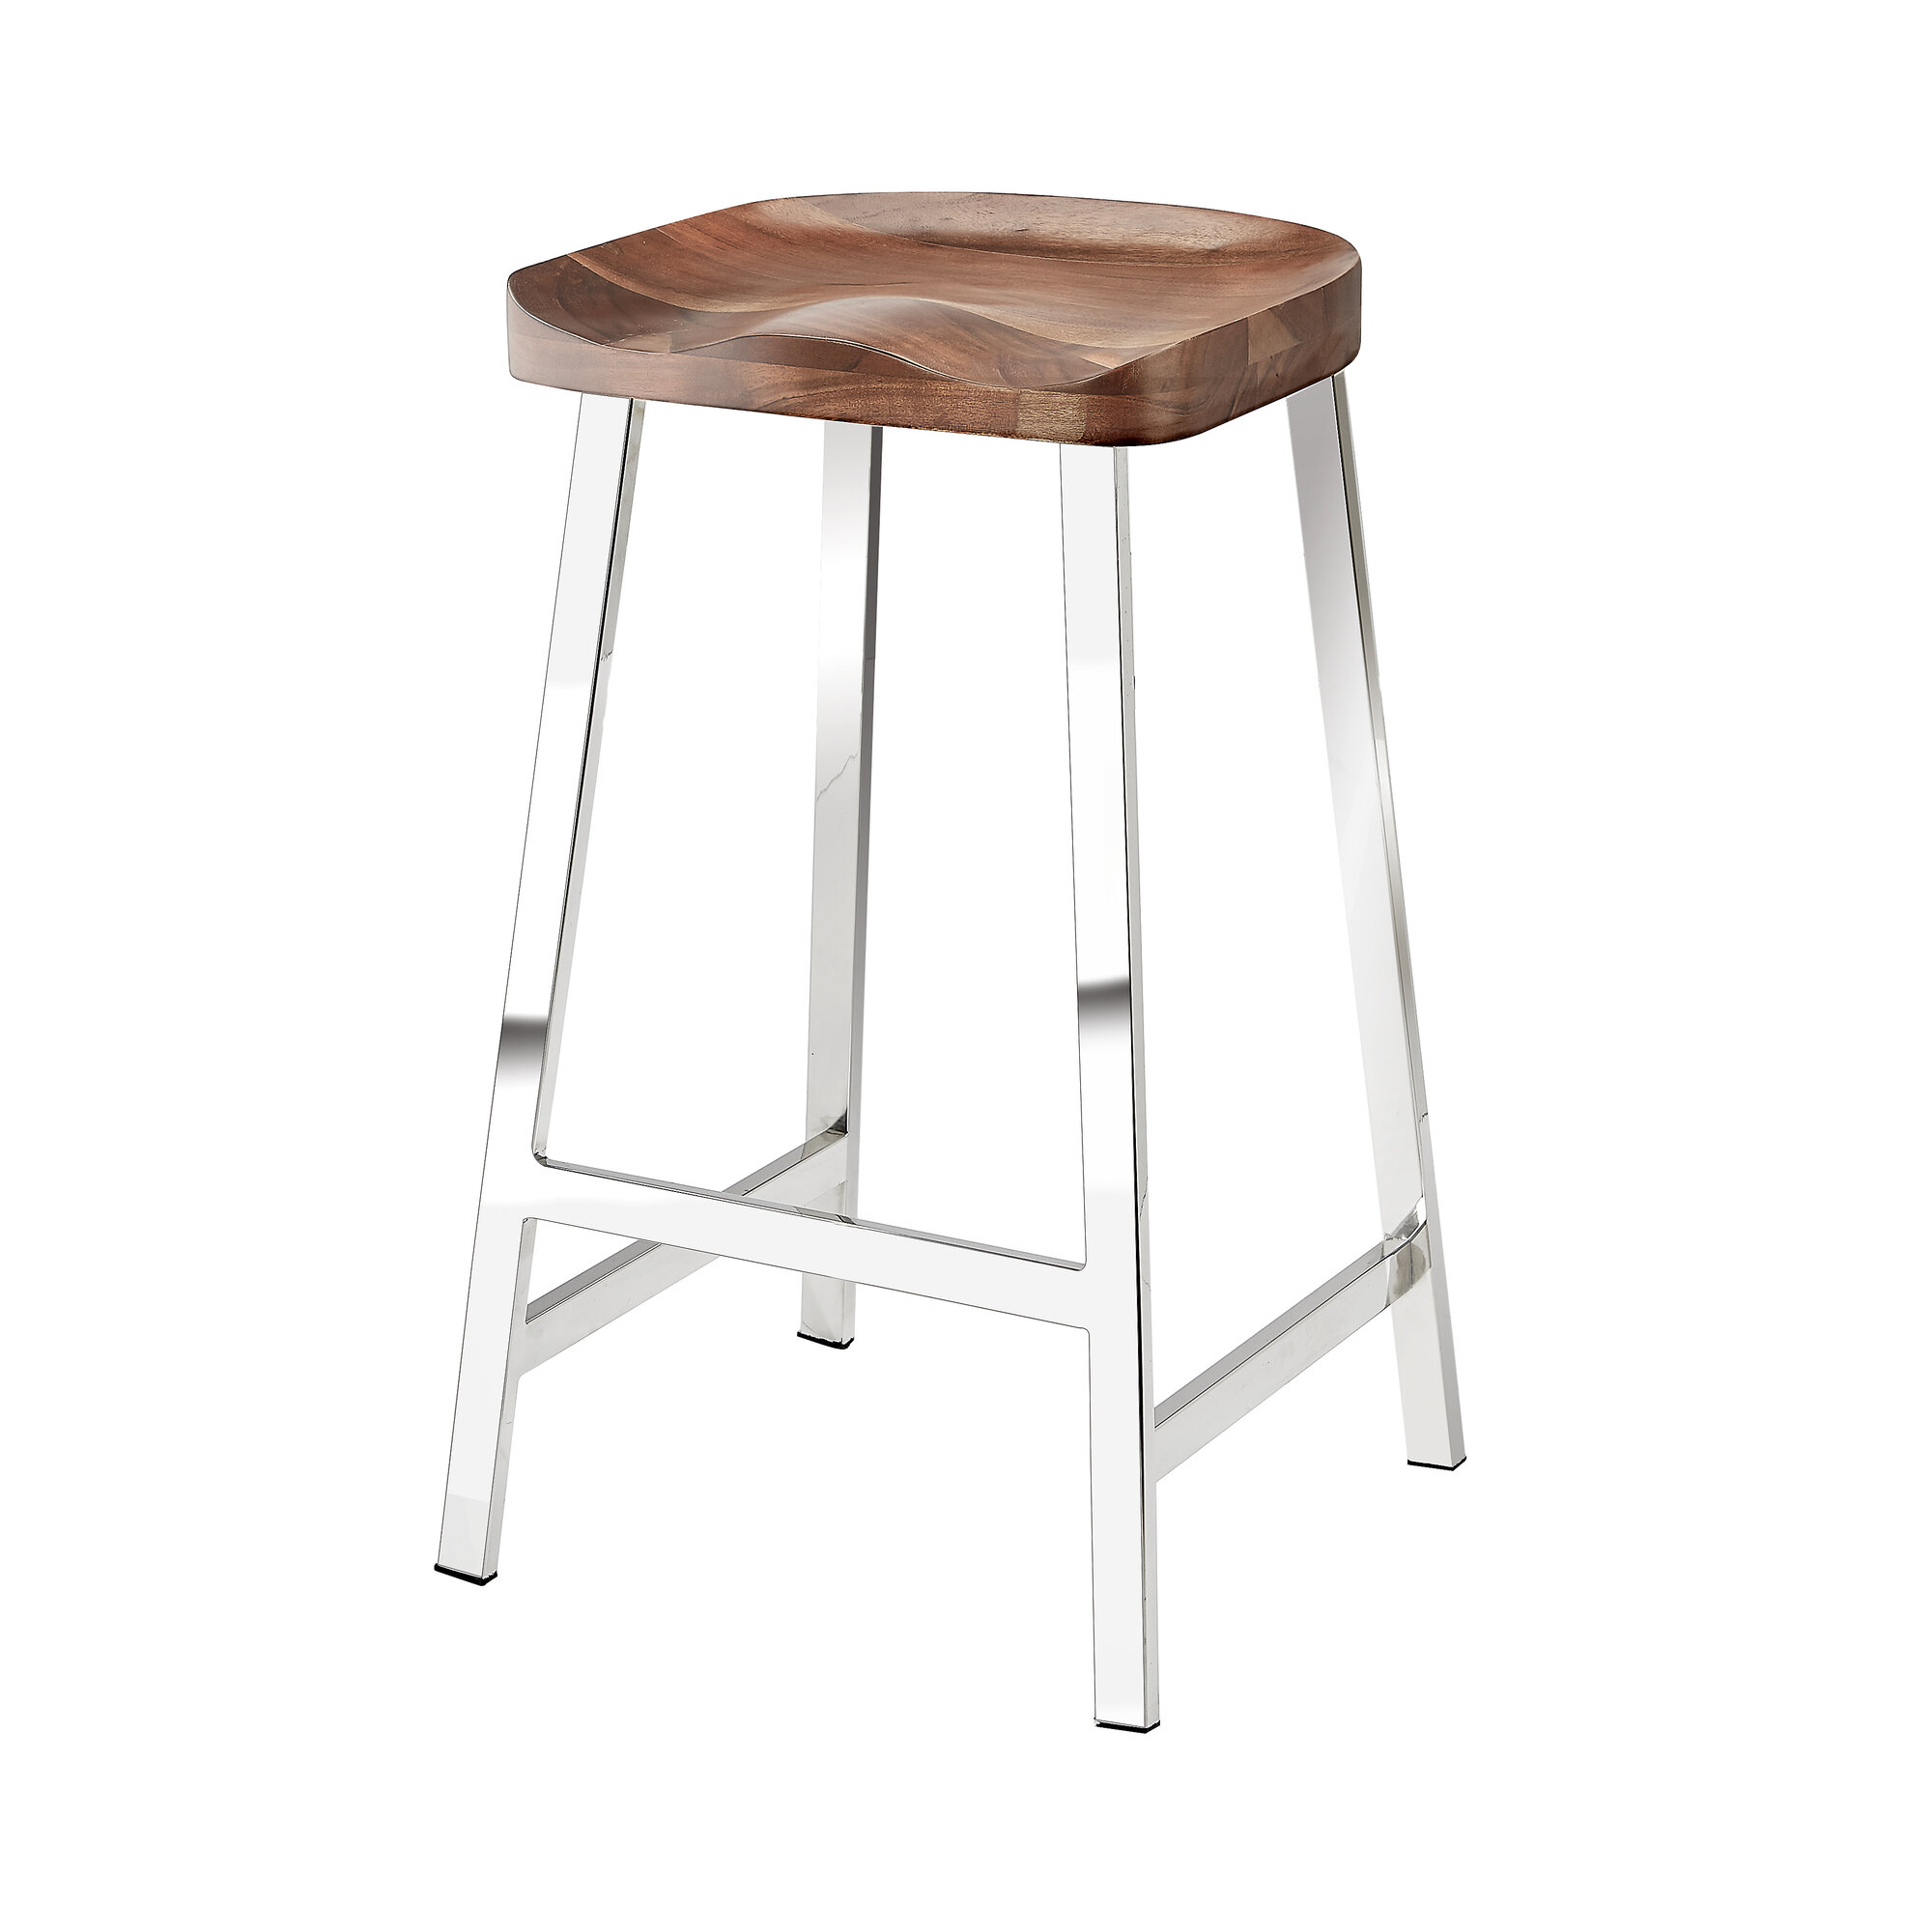 Groovy Details About Ivy Bronx Lockman 26 Bar Stool Set Of 2 Evergreenethics Interior Chair Design Evergreenethicsorg